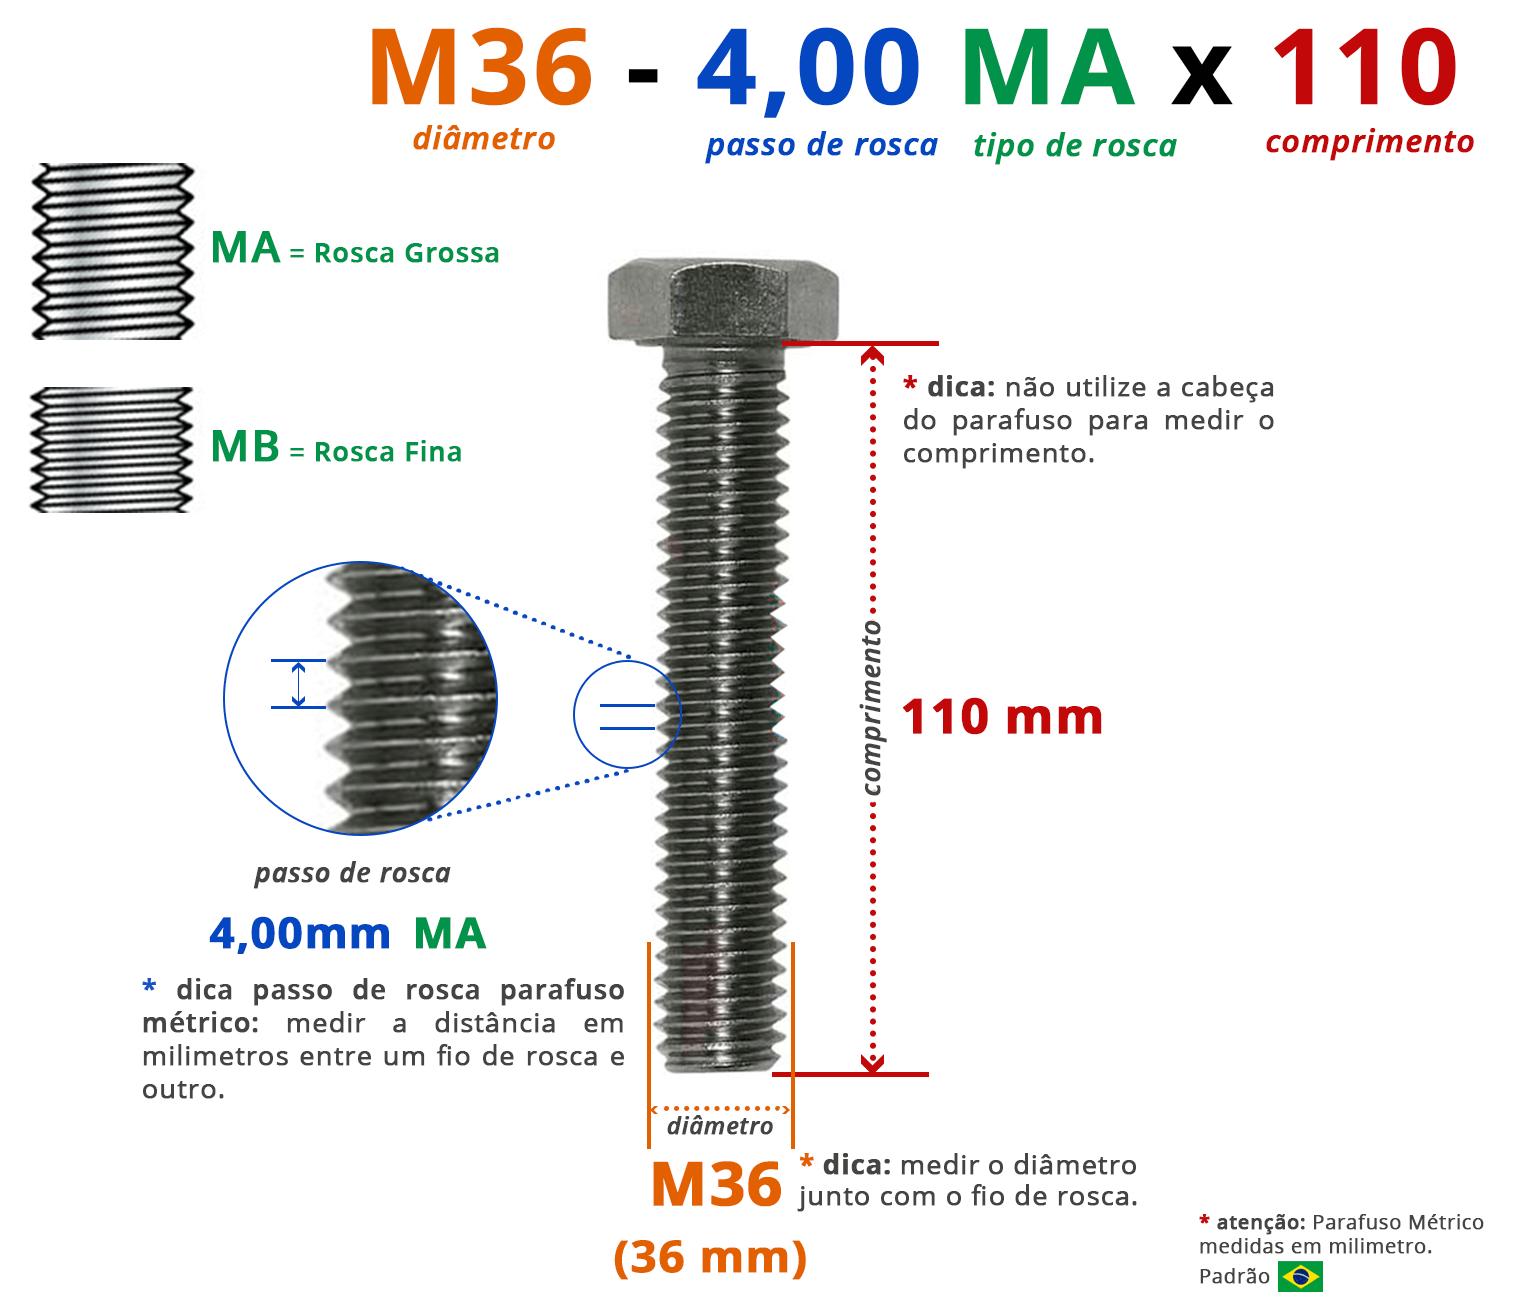 PARAFUSO SEXTAVADO ROSCA INTEIRA M36 4,00 MA X 110 DIN 933 INOX A4